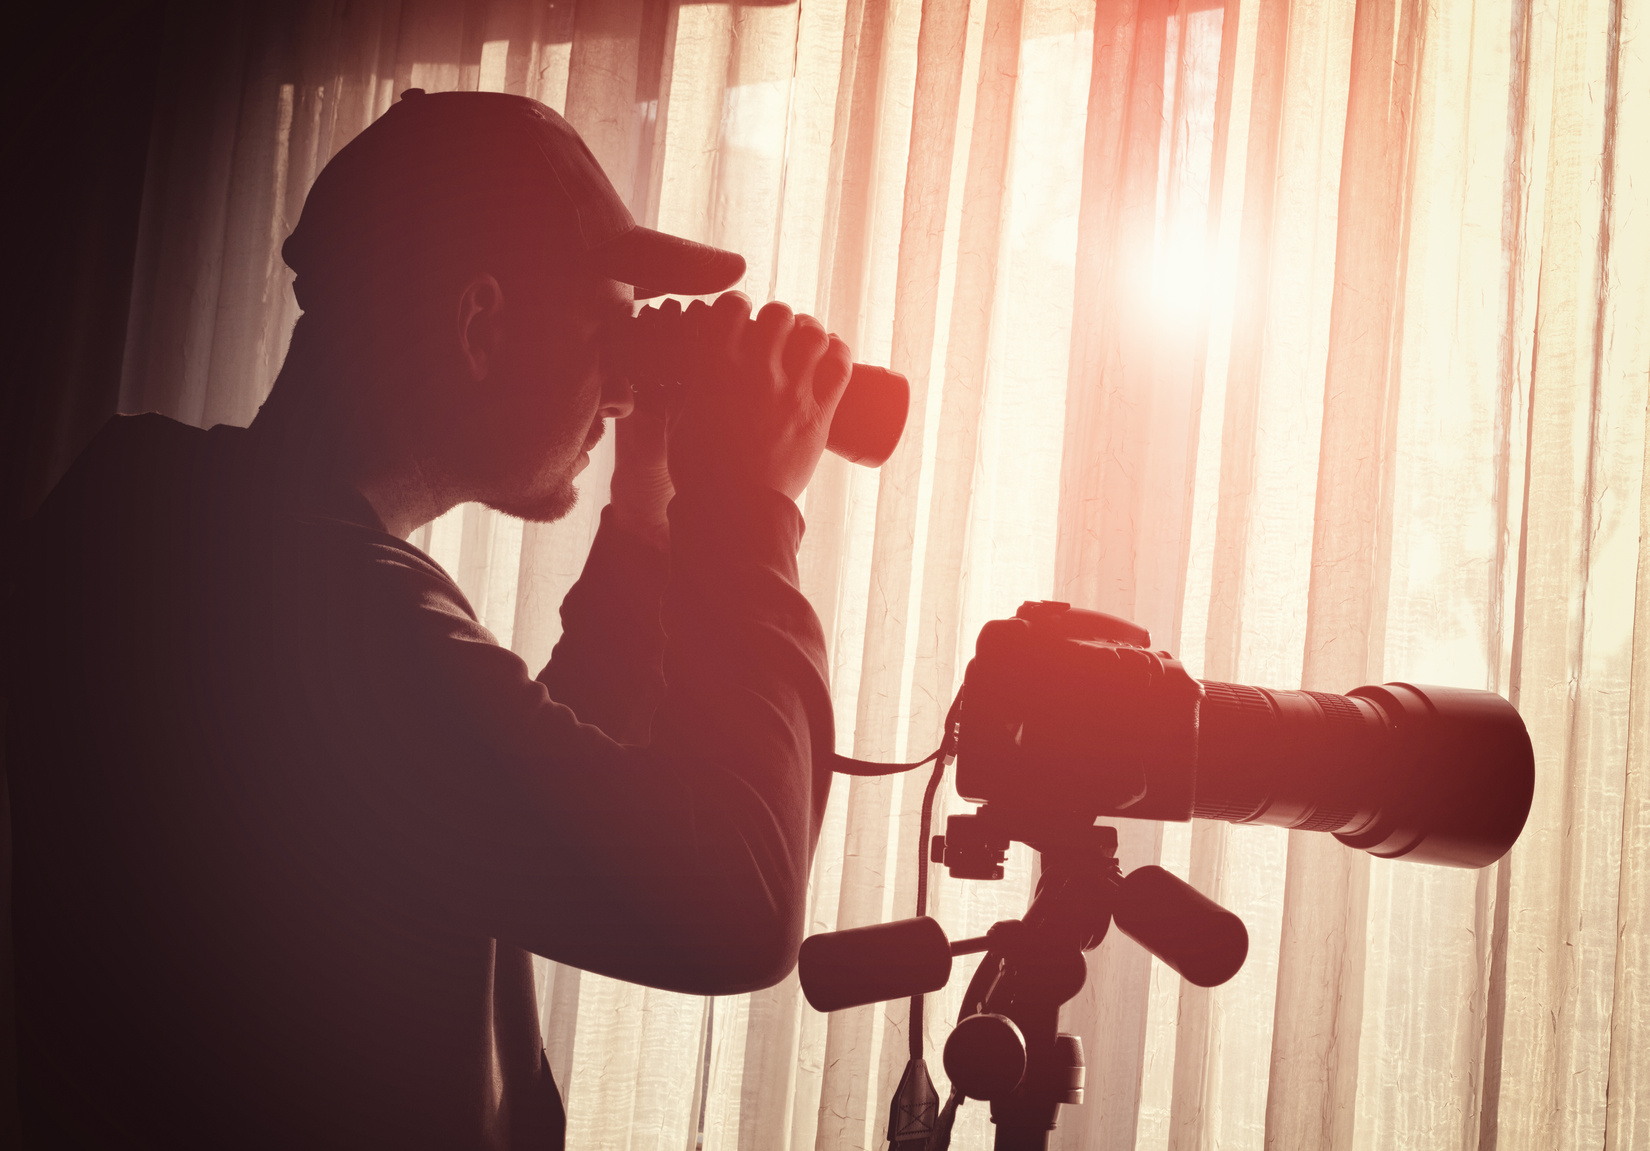 man with binoculars and camera control someone